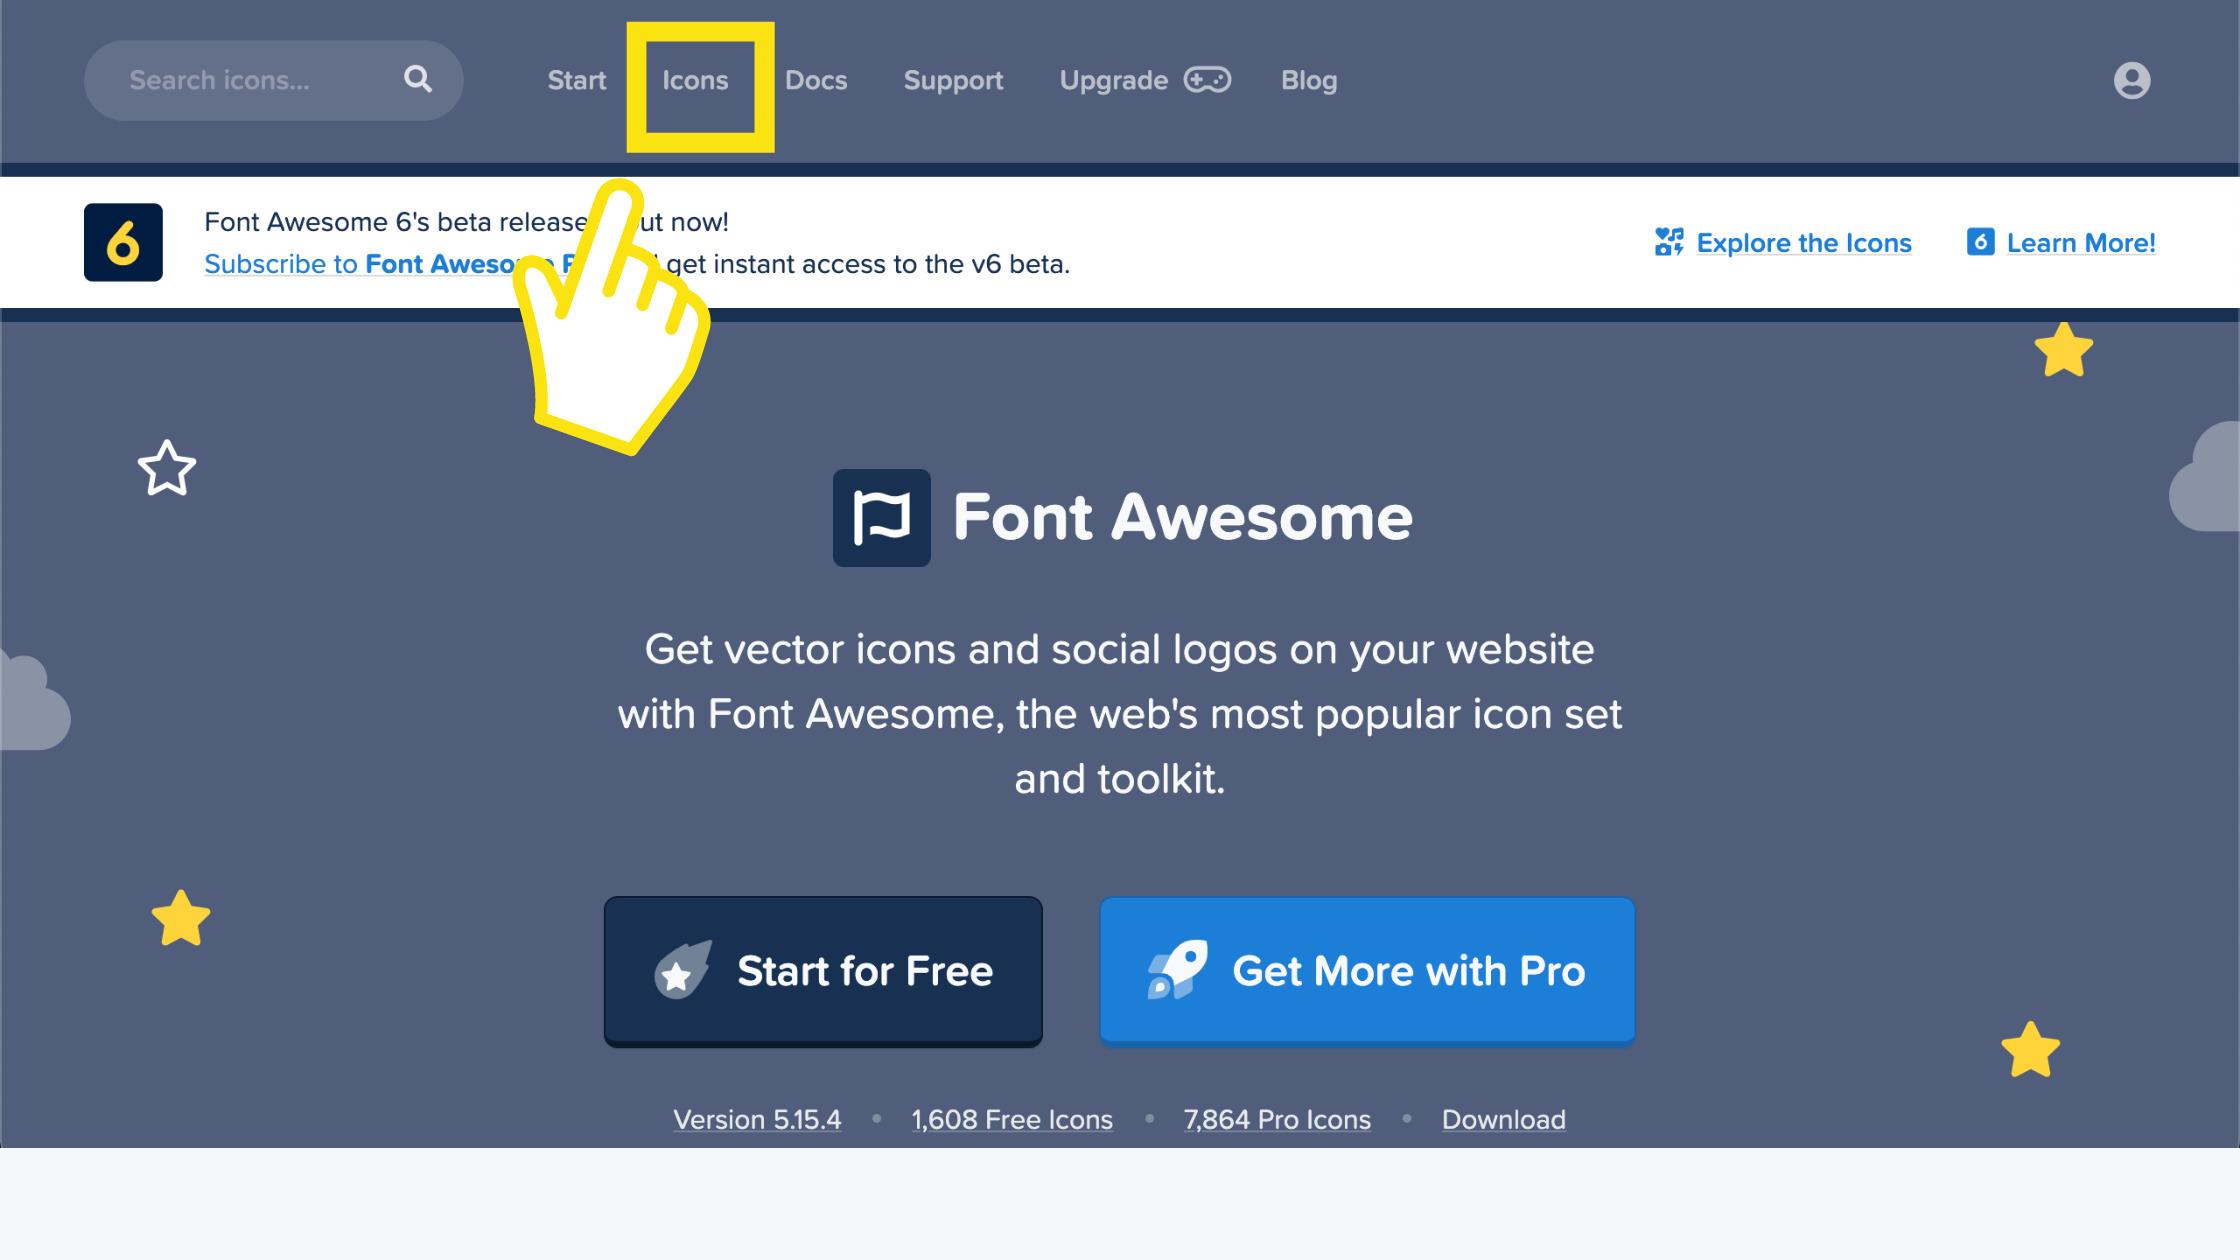 Font Awesomeのアイコンを探してみよう!